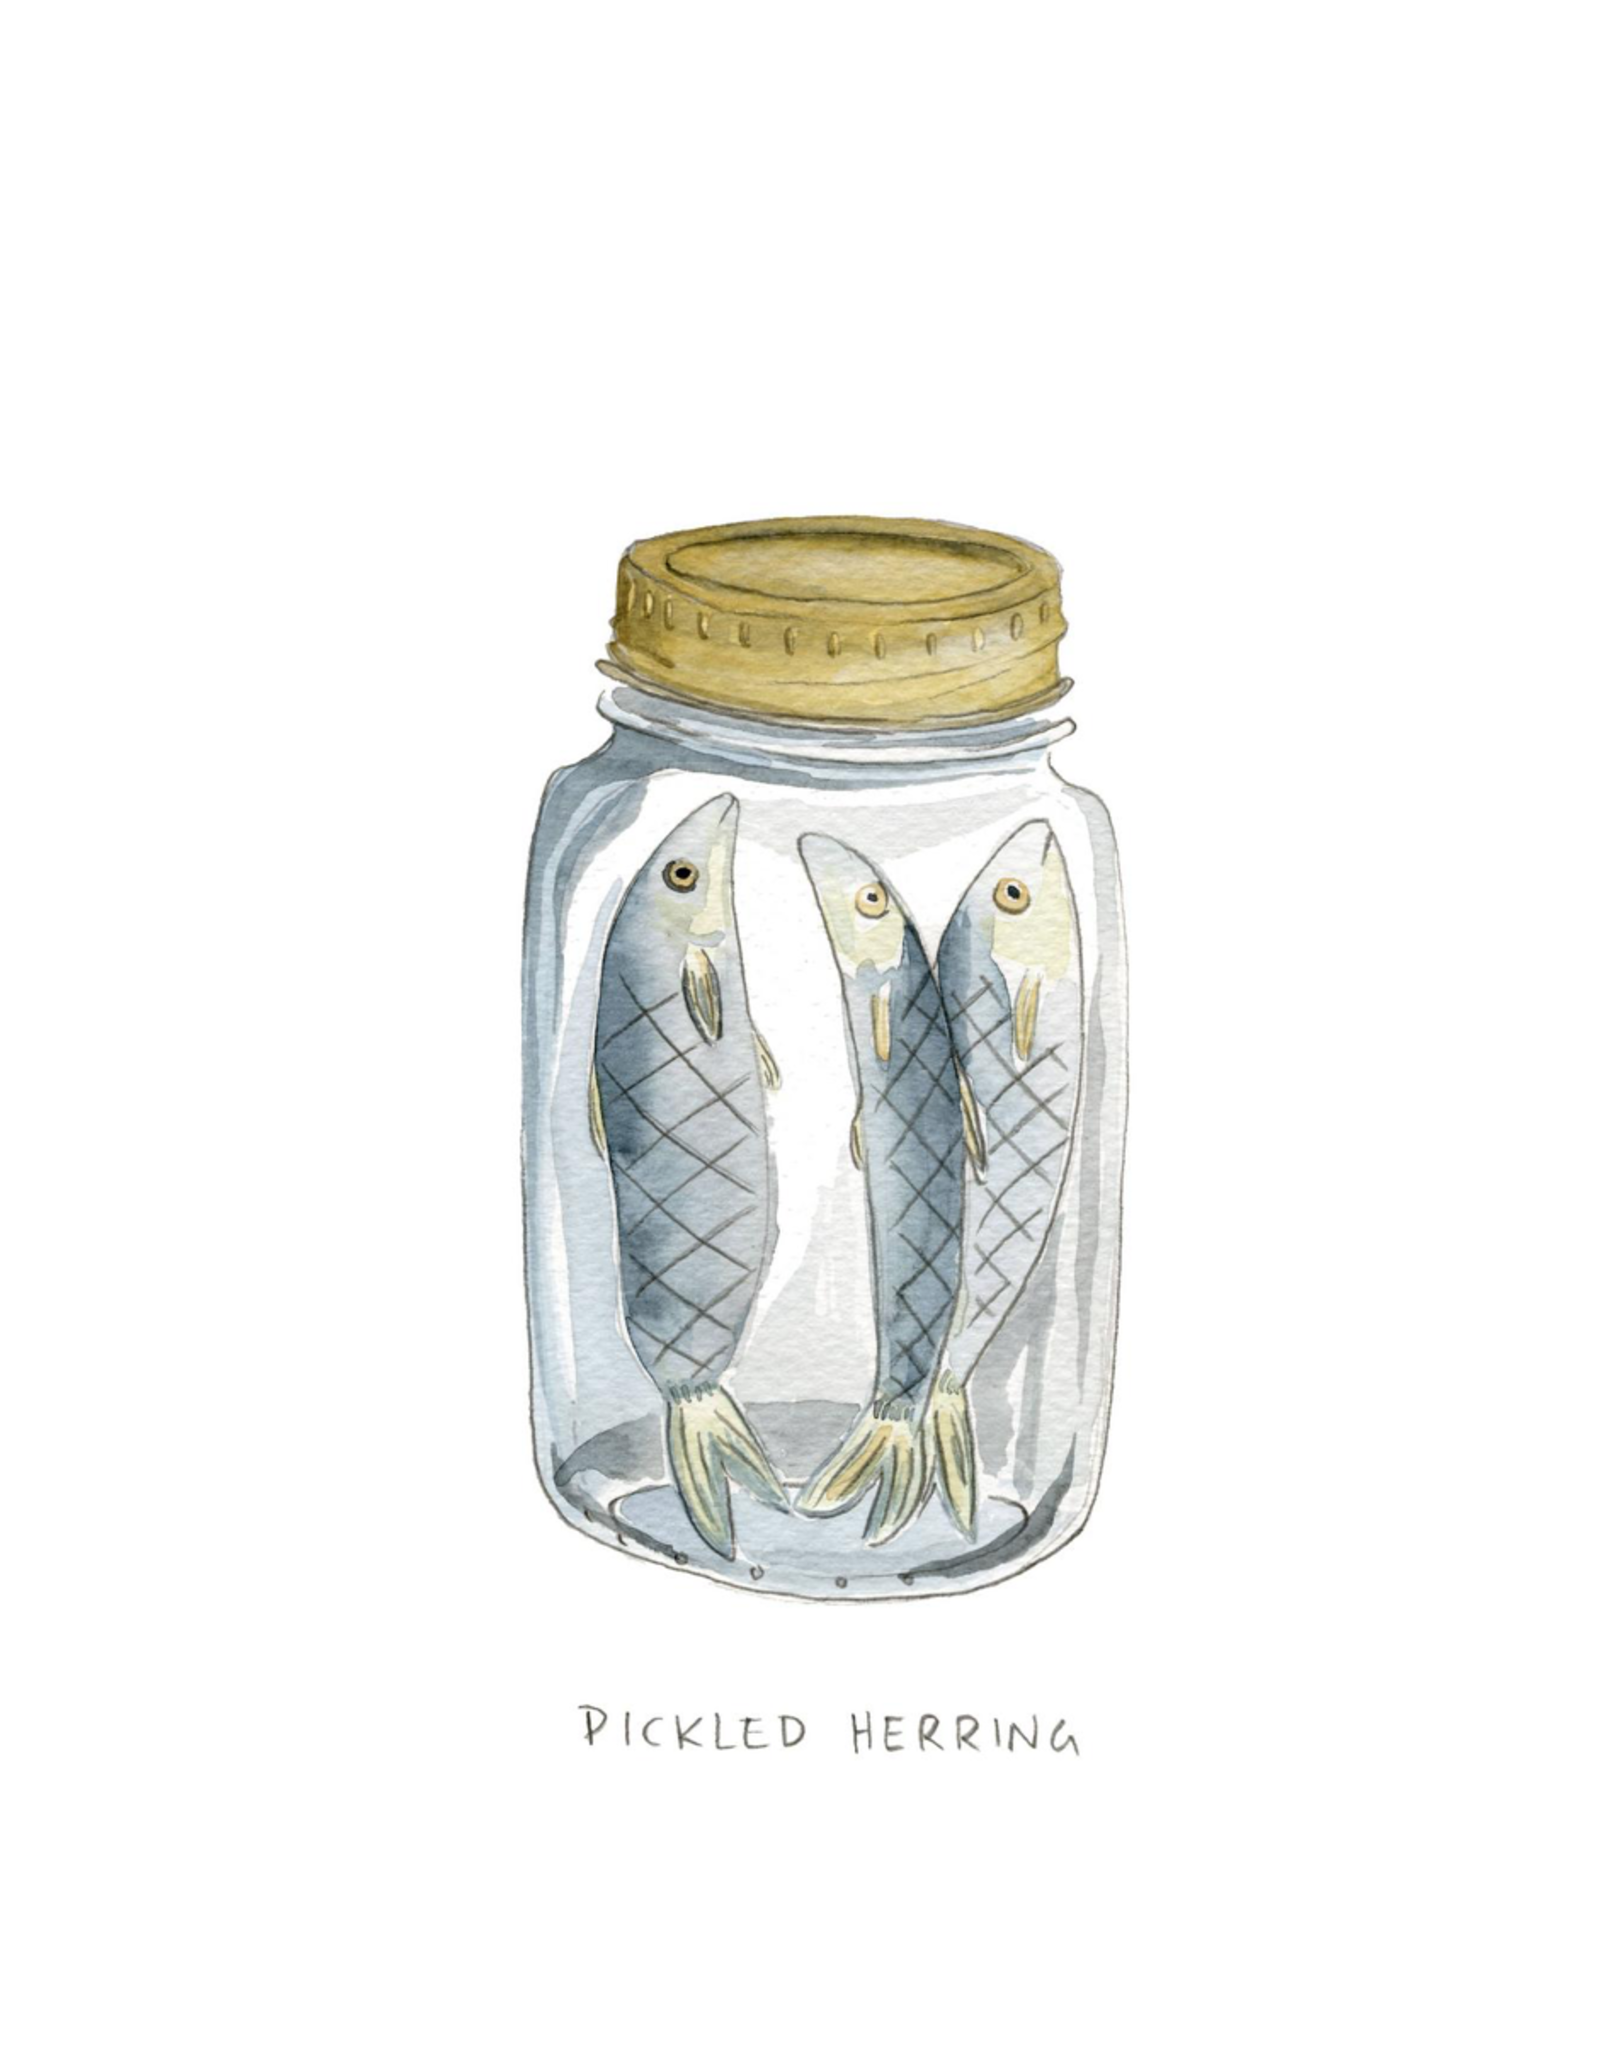 "Kat Frick Miller - Card/Pickled Herring, 4.25 x 5.5"""